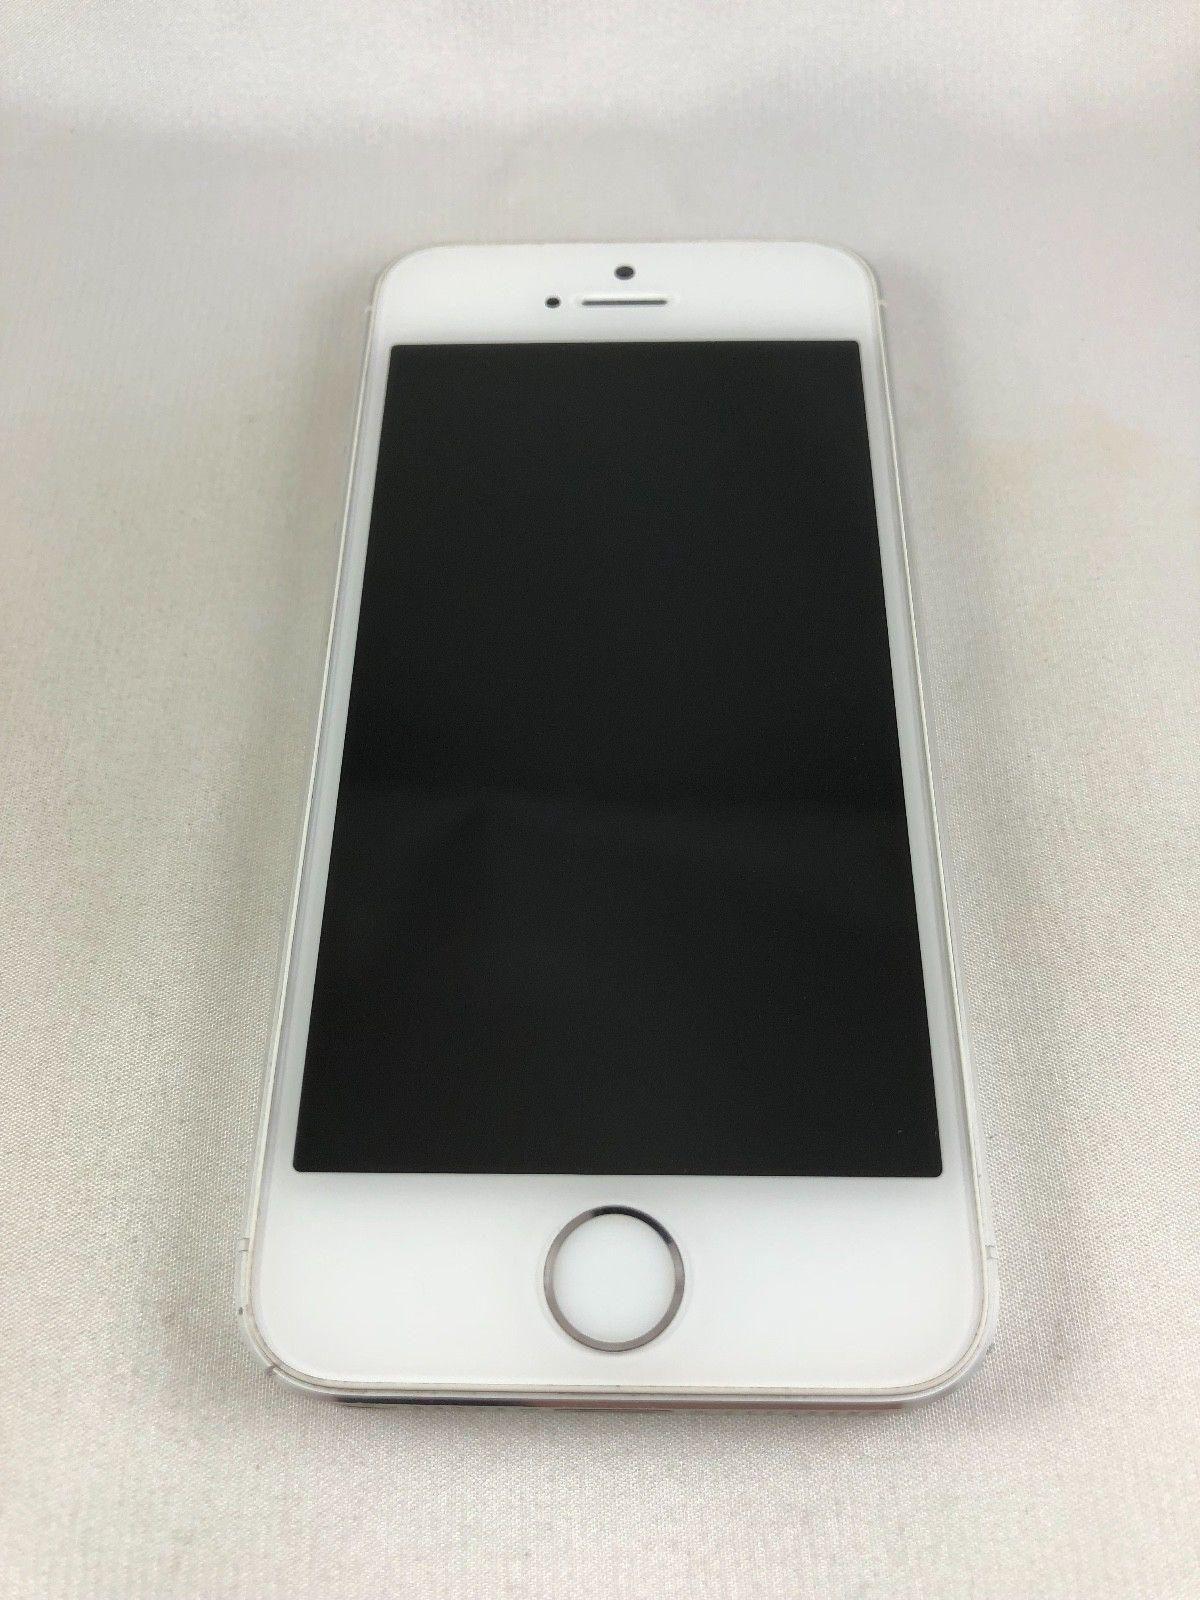 iphone apple ios Apple iPhone 5s 16GB A1453 ME351LL A iOS11